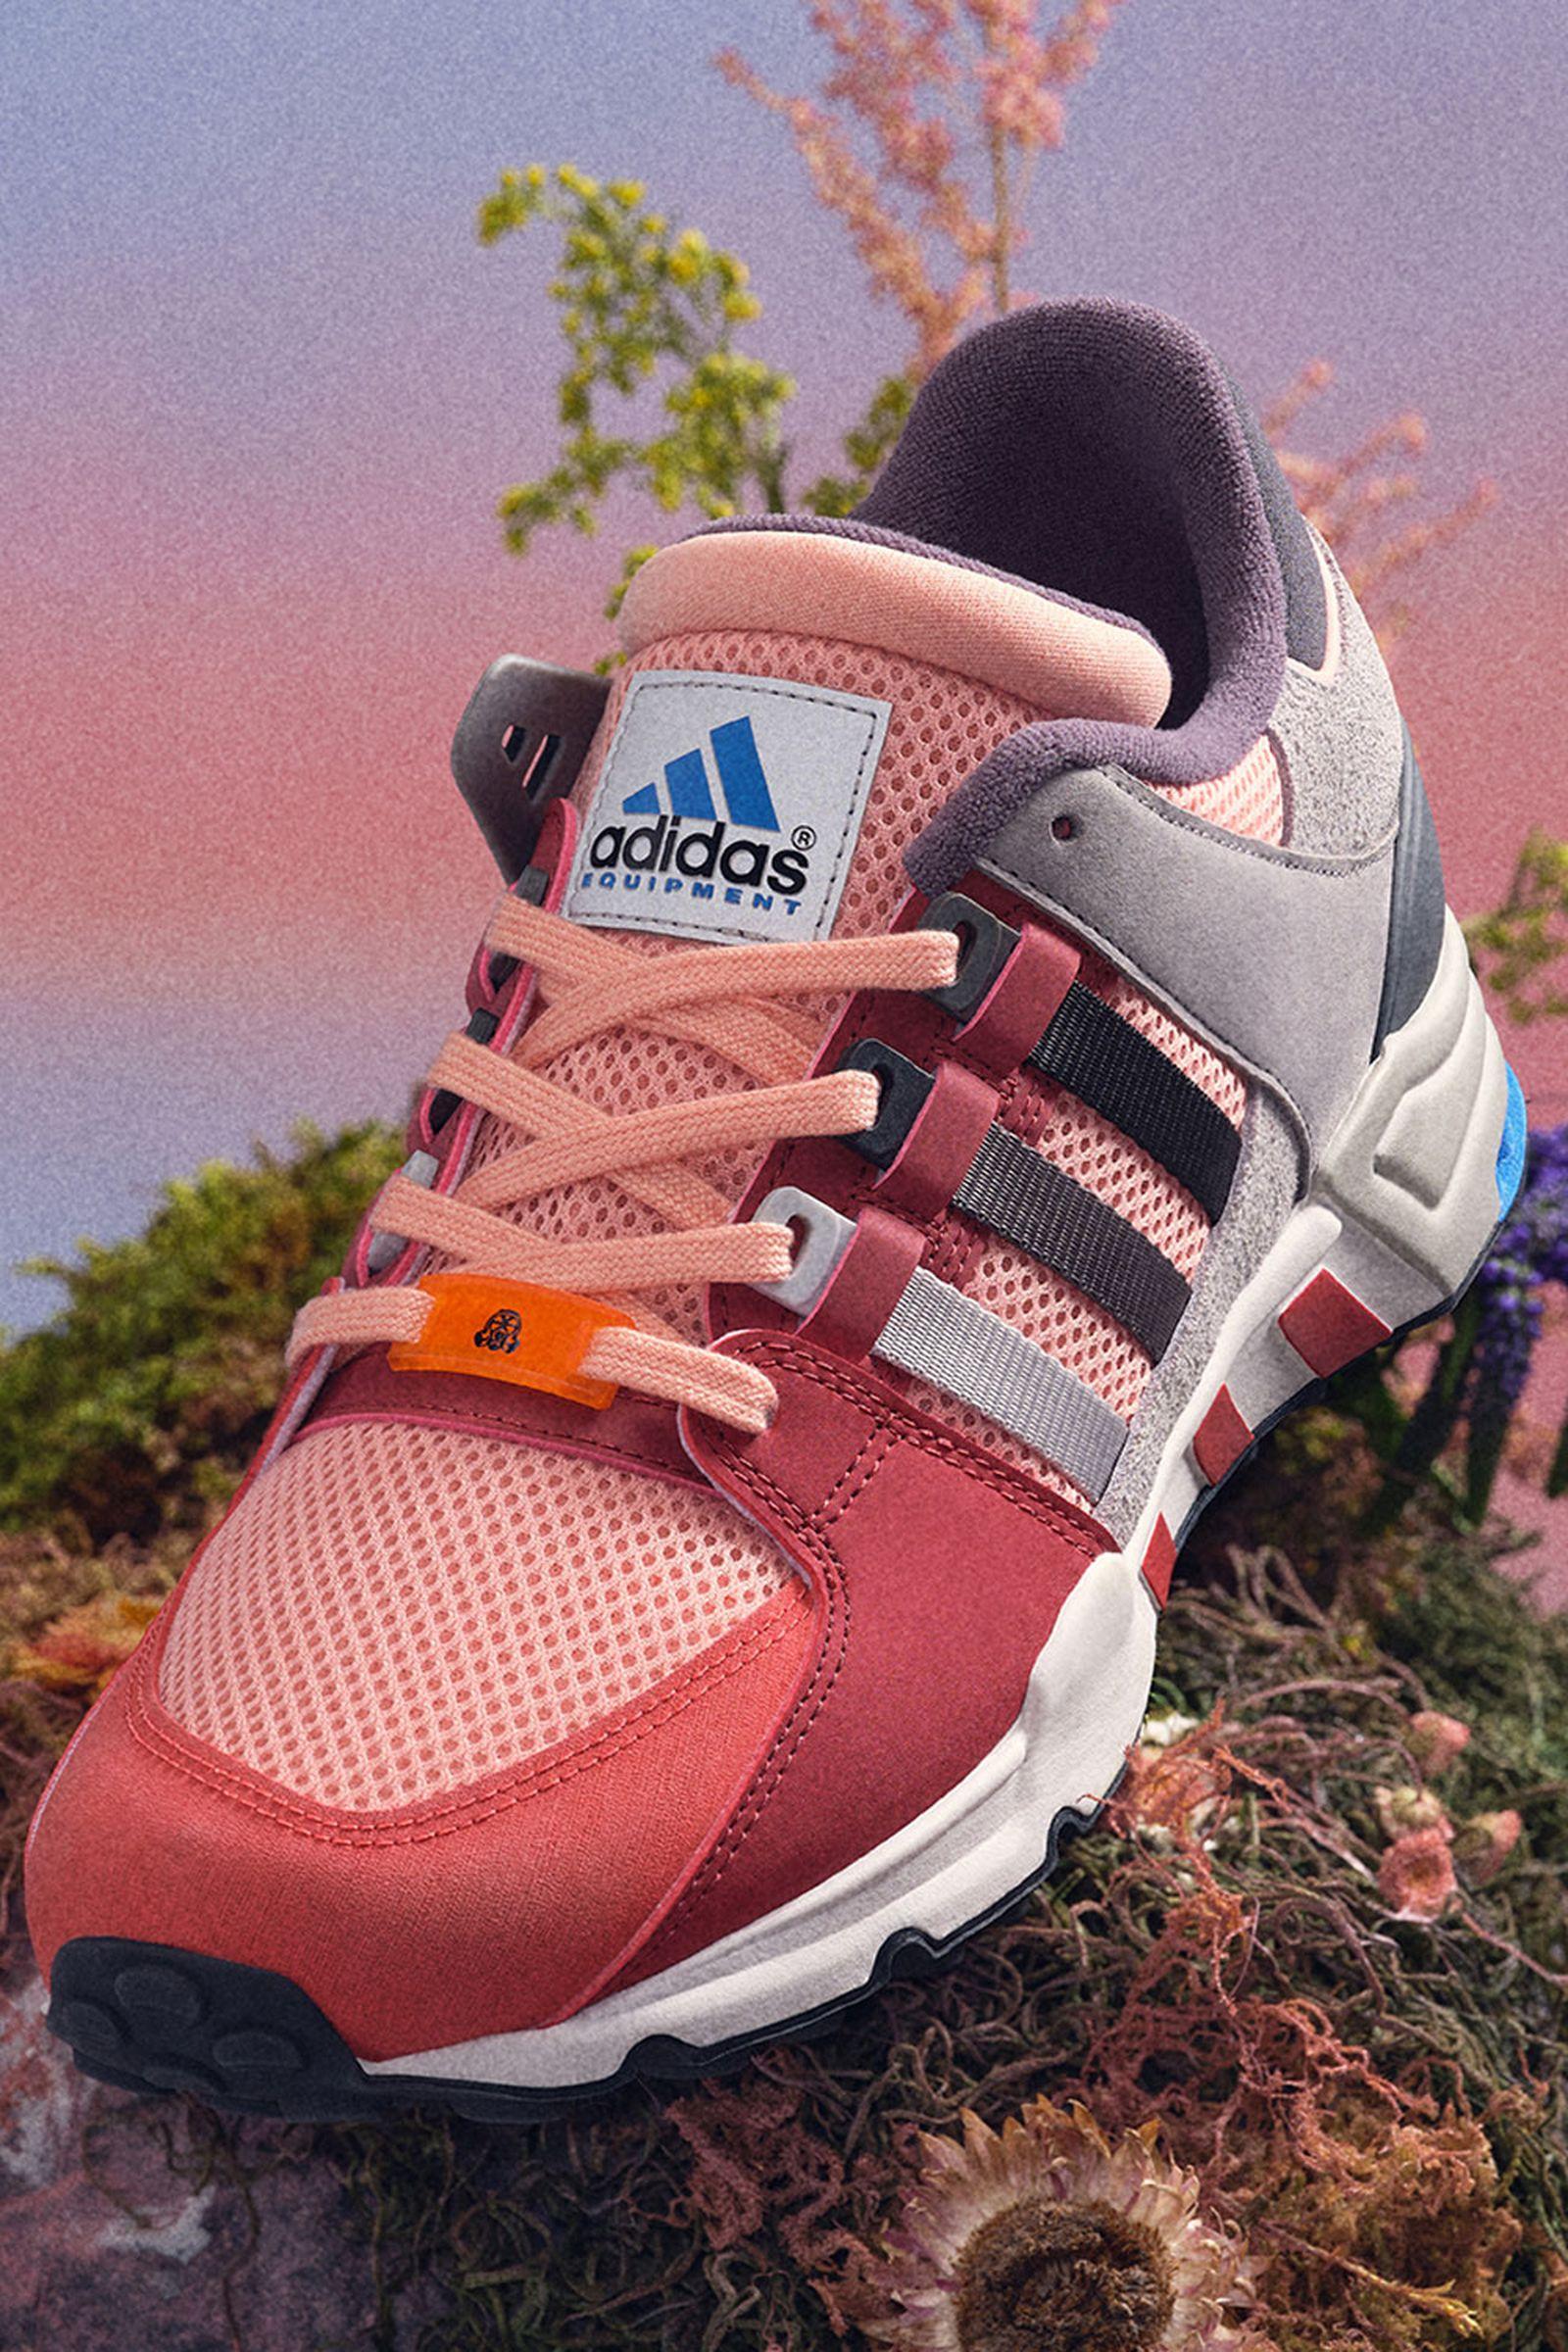 footpatrol-x-adidas-eqt-running-support-93-release-info-05